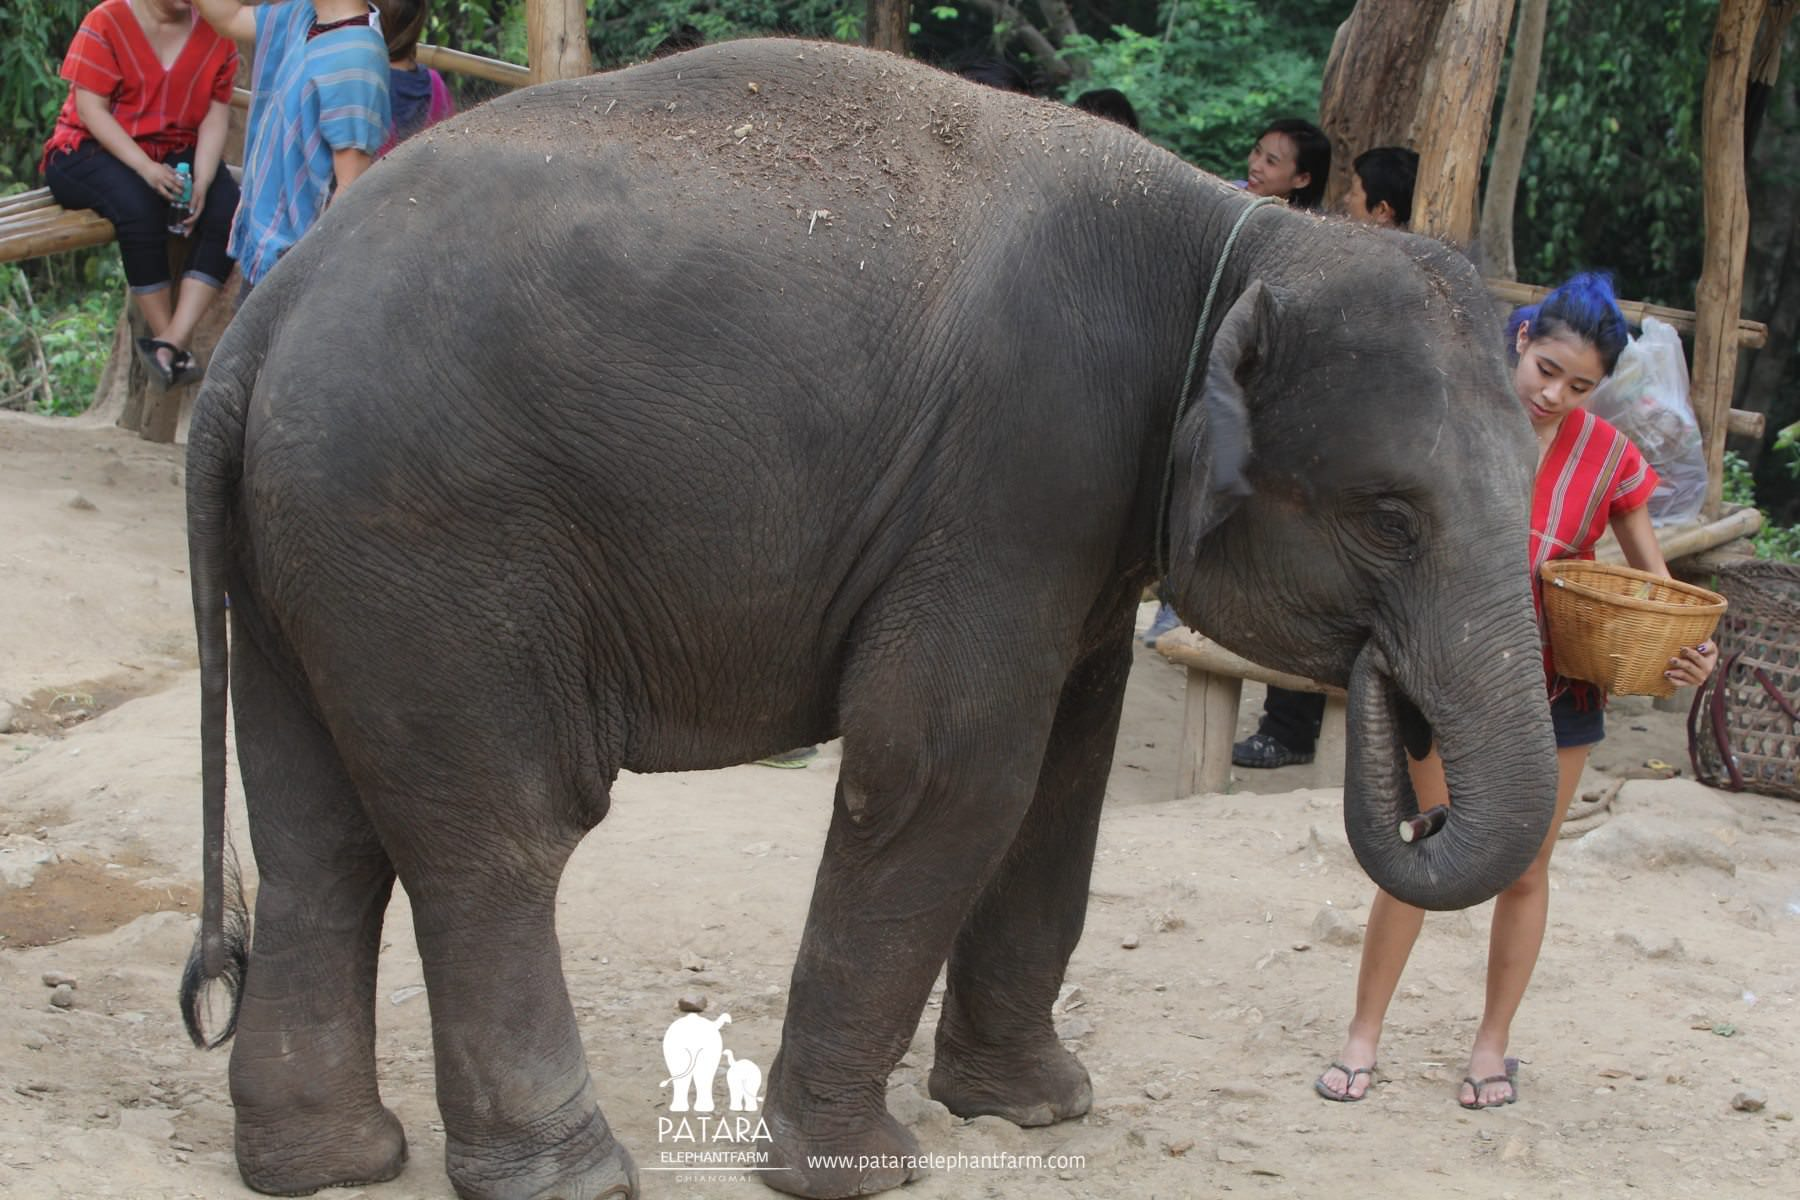 PataraElephantFarm-ChiangMai-Feed